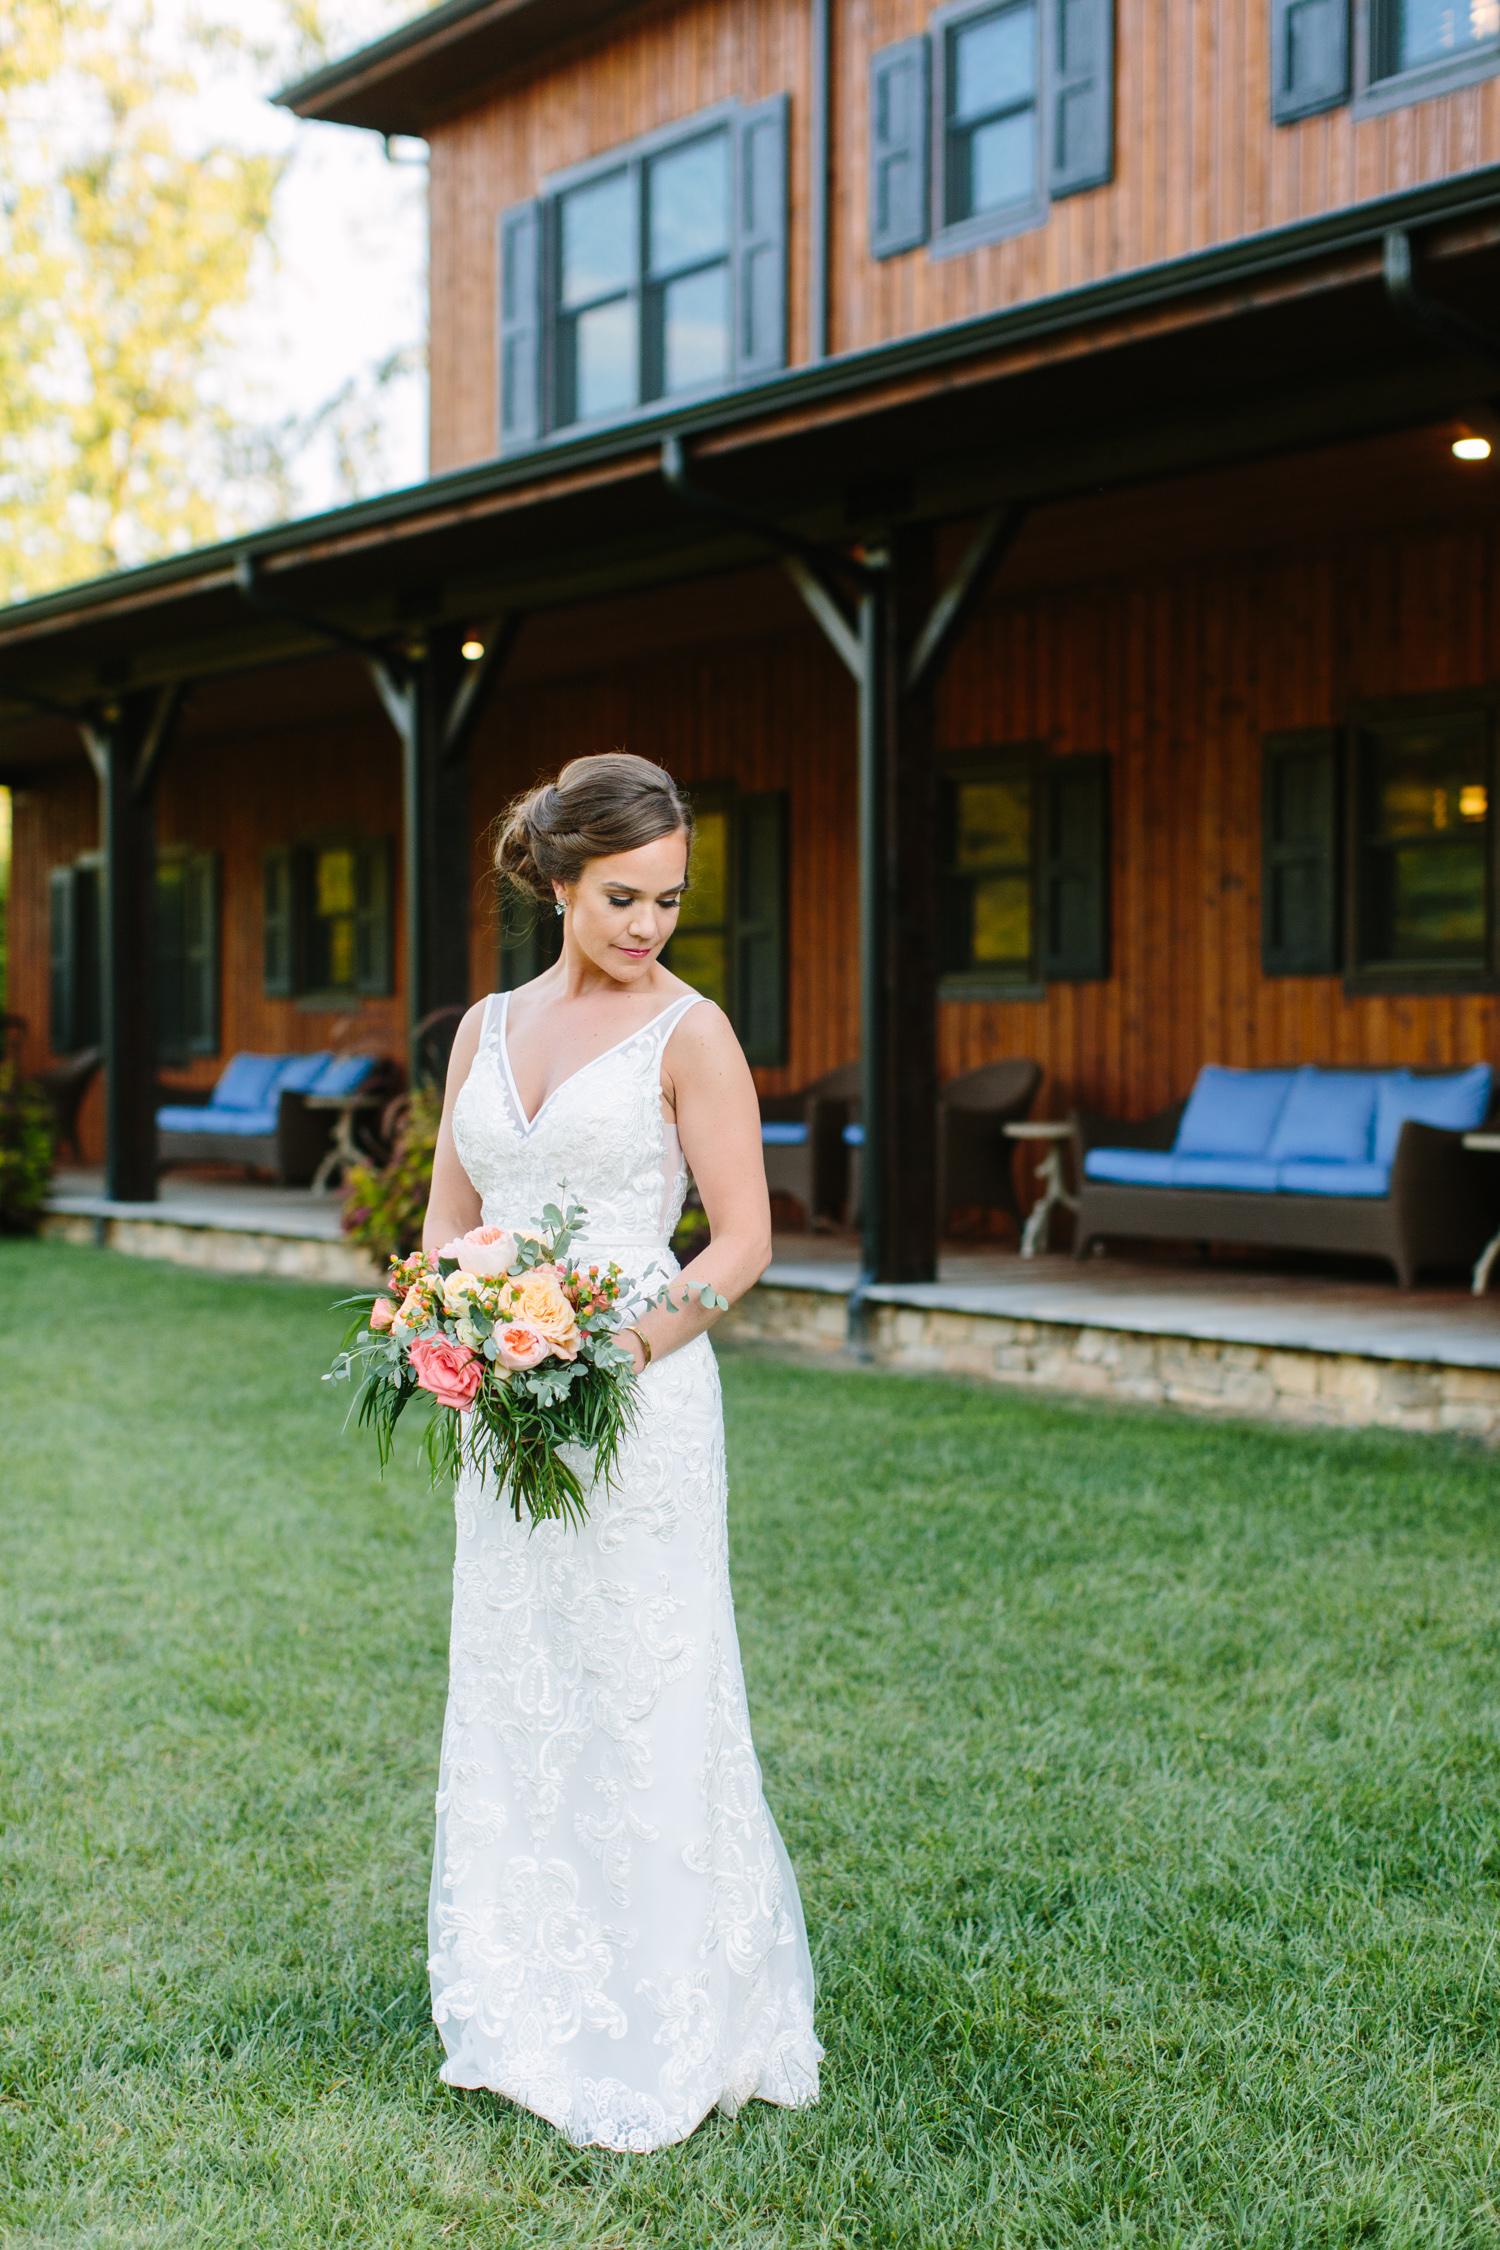 Bridal Portrait Romantic Pavilion Wedding // Tennessee Photographer // Suzy Collins Photography // The Olde Farm